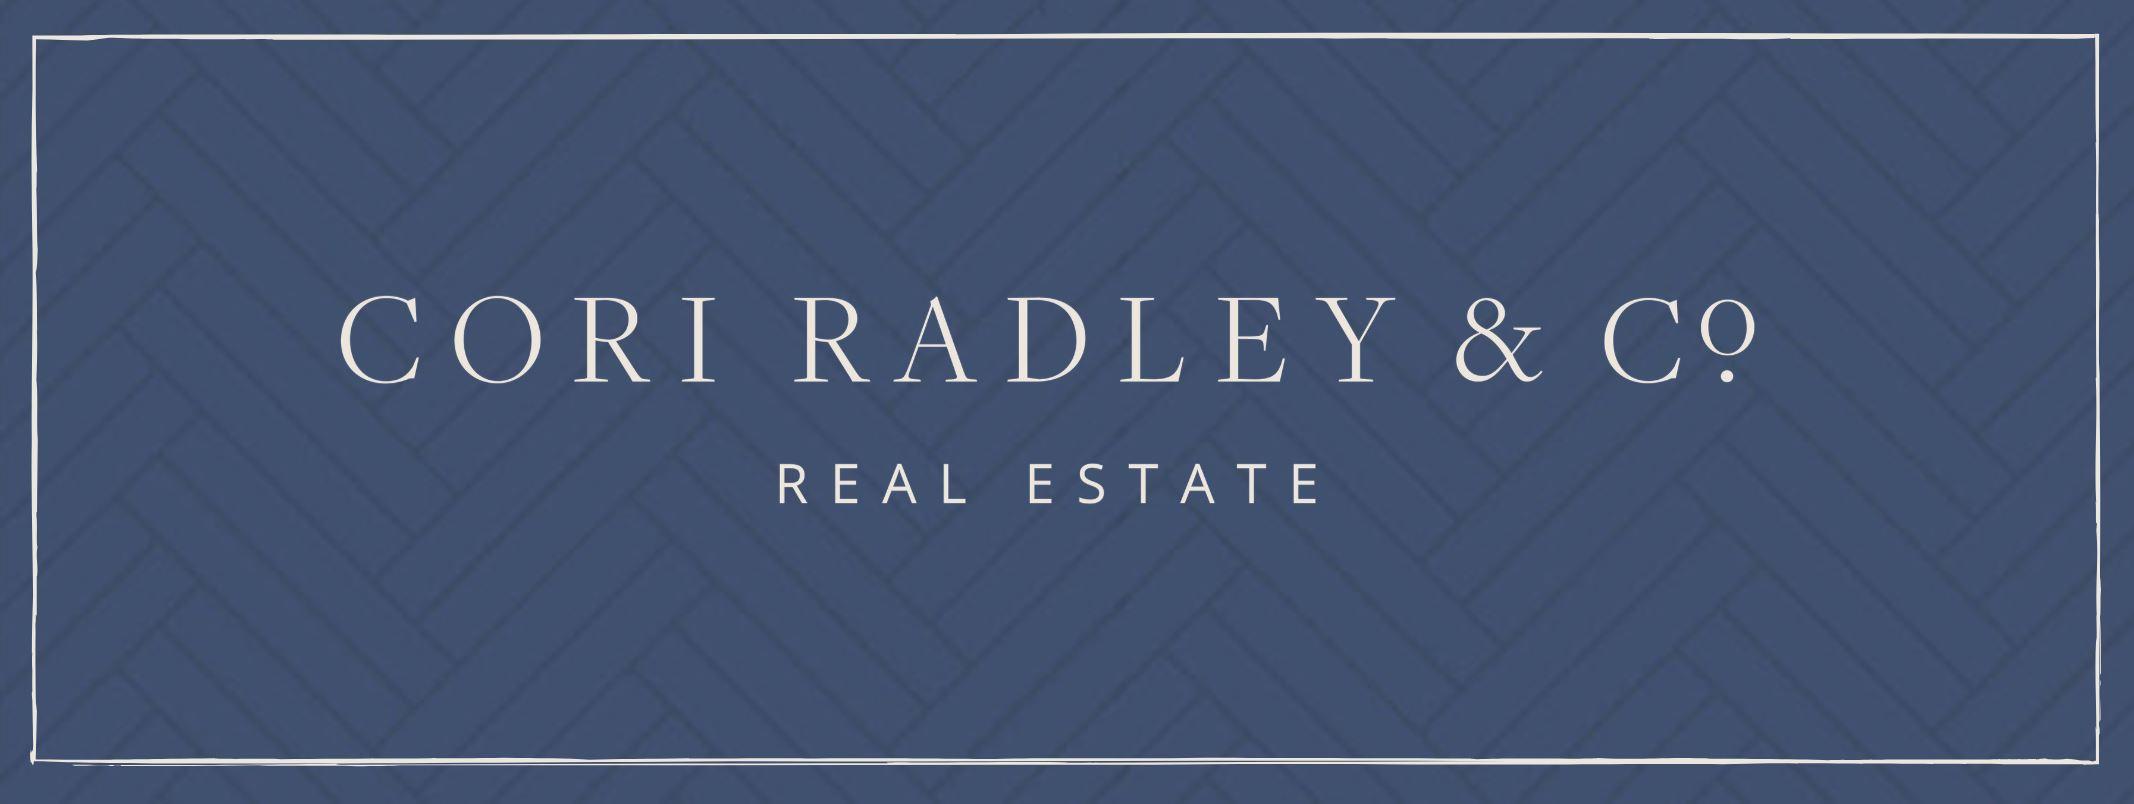 Cori Radley & Co